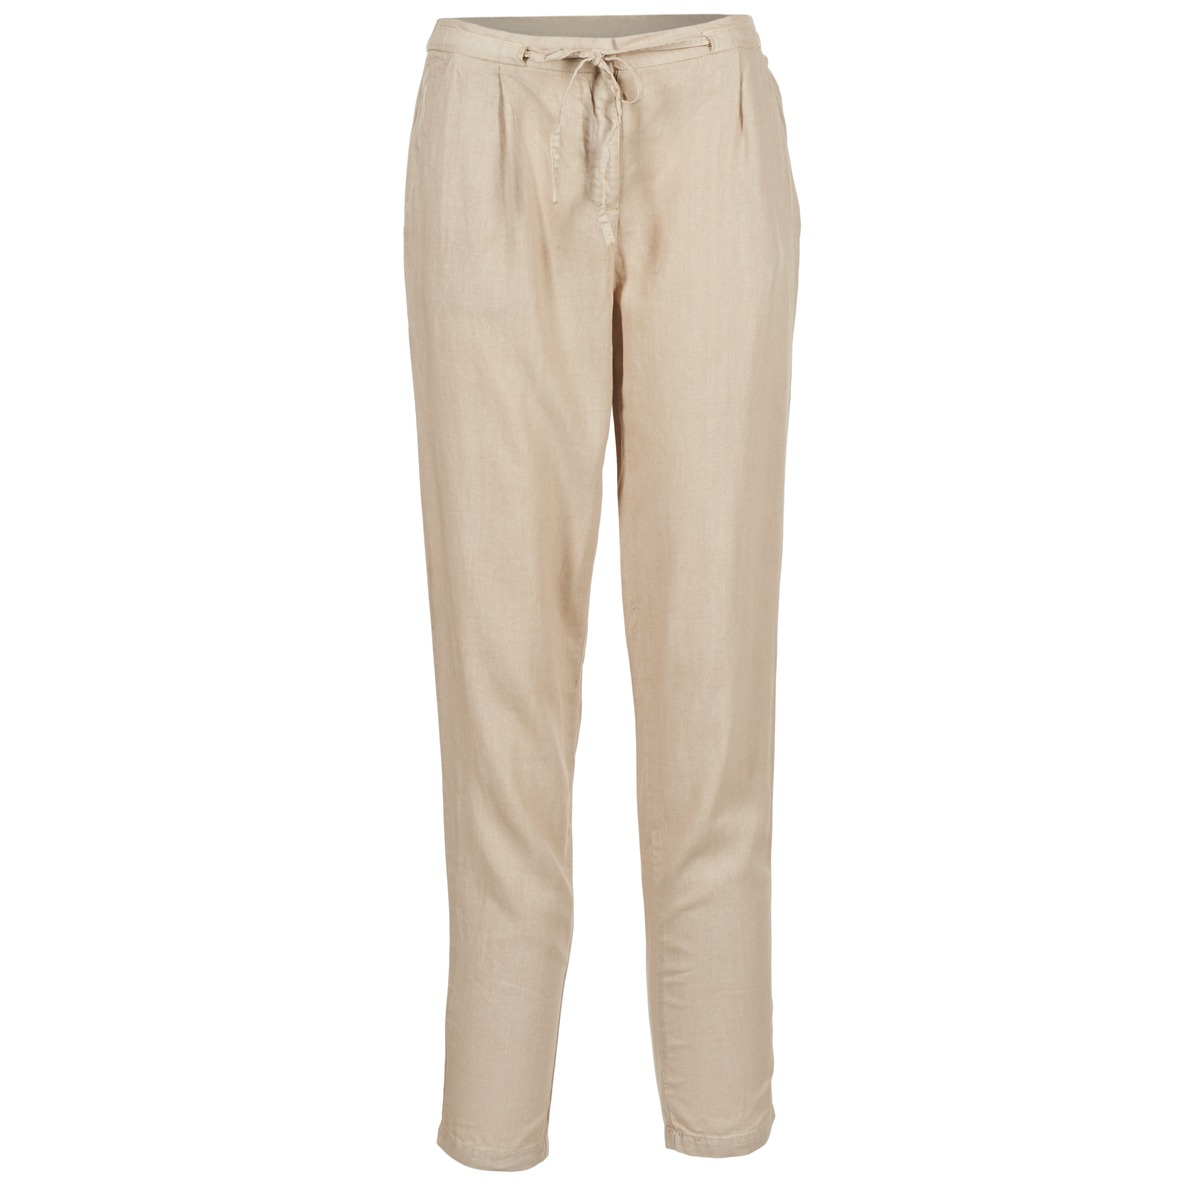 Pantalons fluides Best Mountain DOUNE Beige